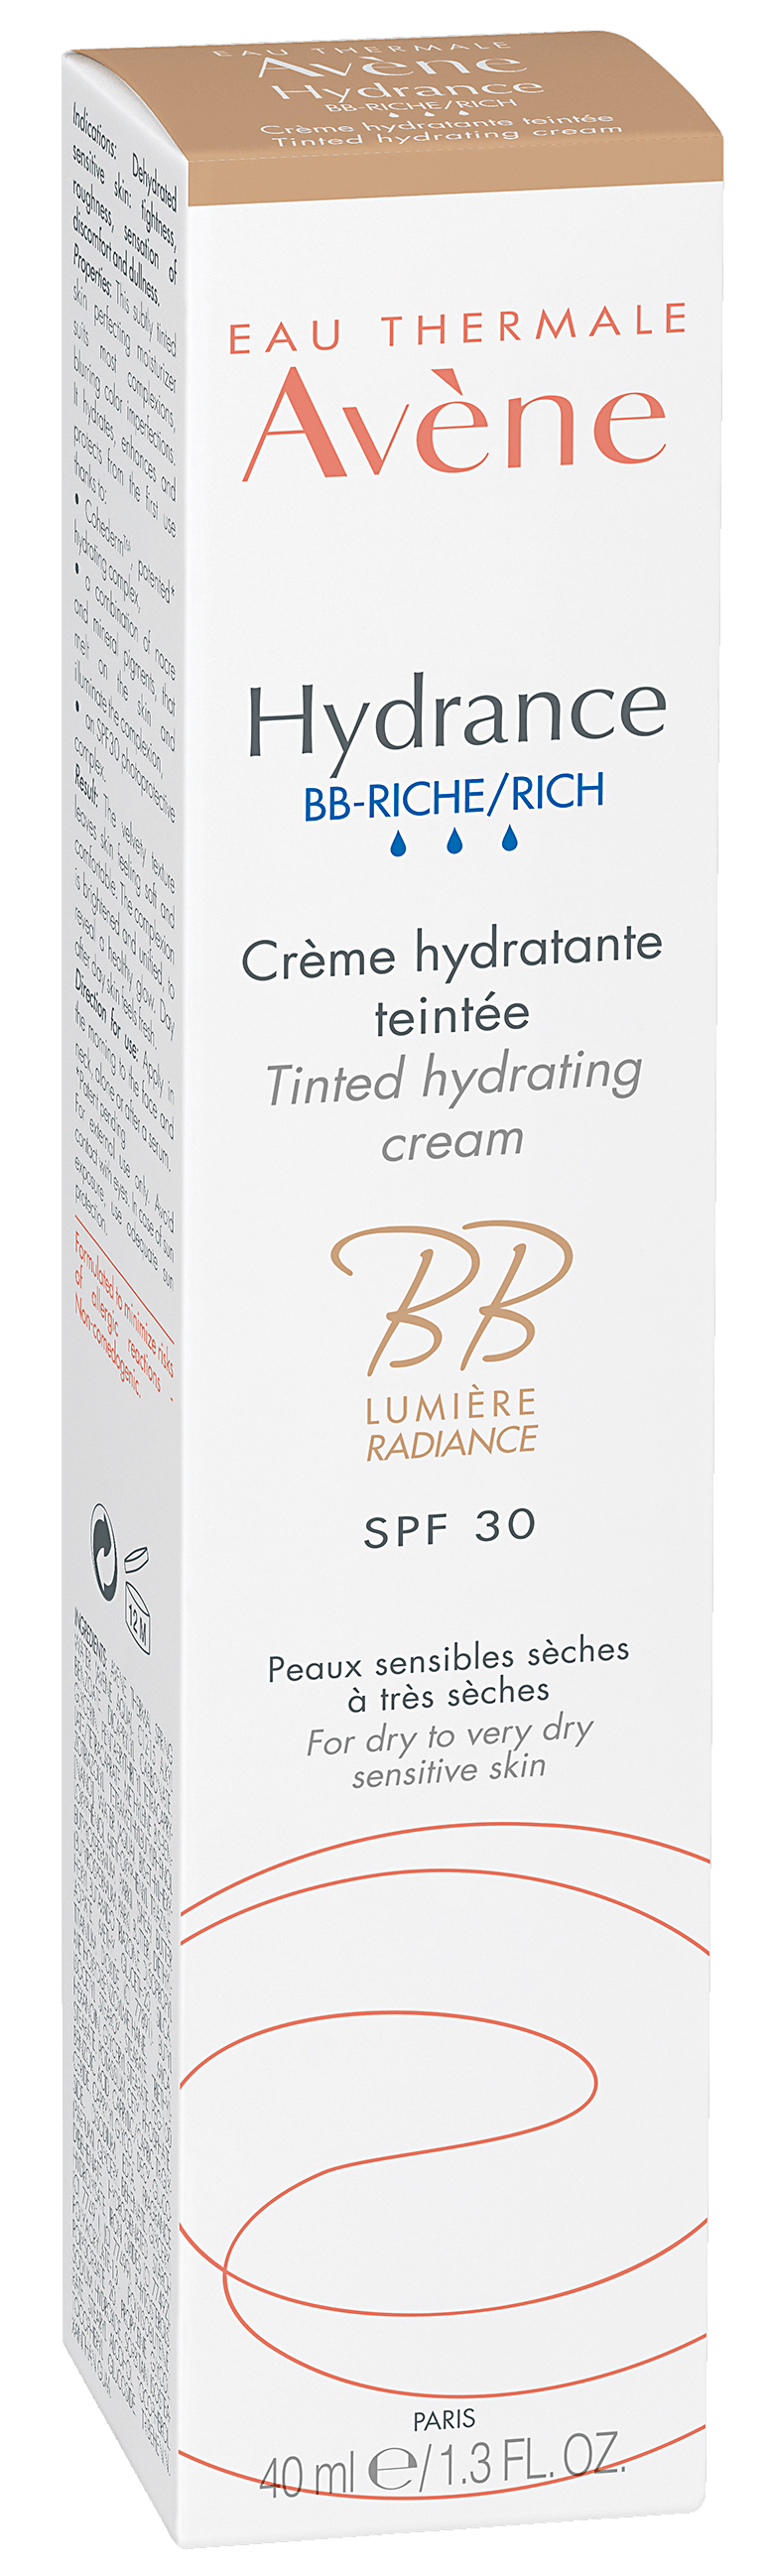 Hydrance BB-riche крем питательный тонирующий SPF30 40мл Avene (Авен)